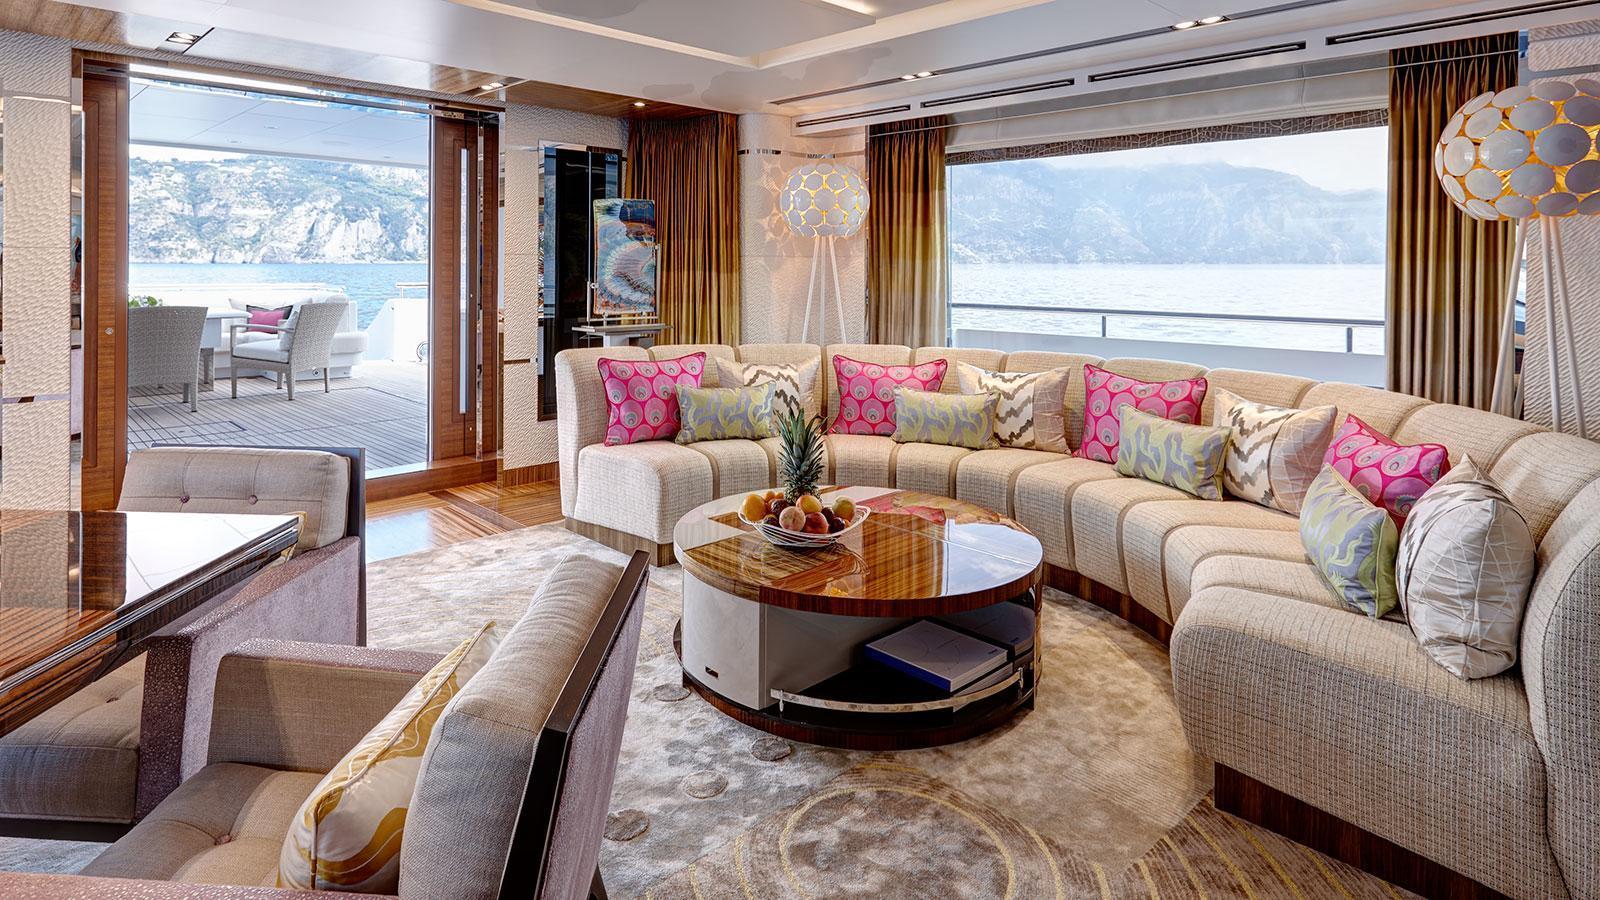 moon-sand-motor-yacht-feadship-2015-44m-upper-saloon